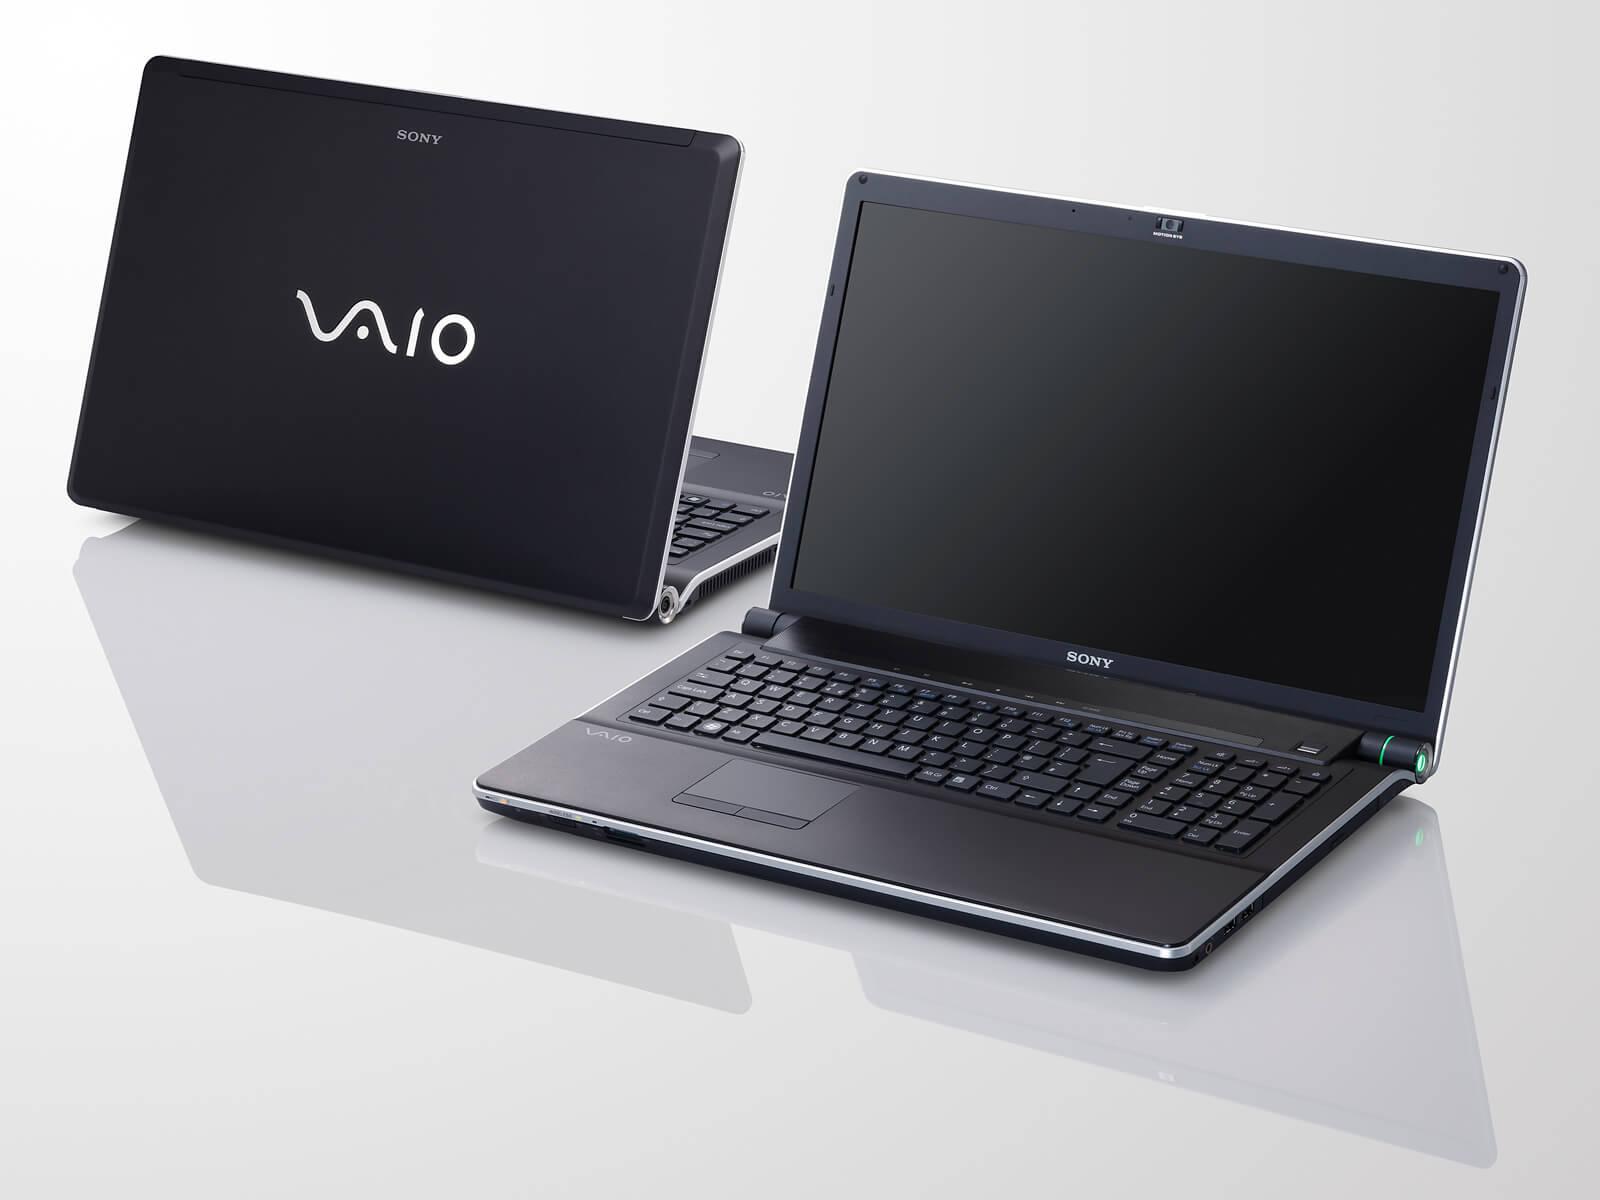 Ремонт компьютеров Sony Vaio